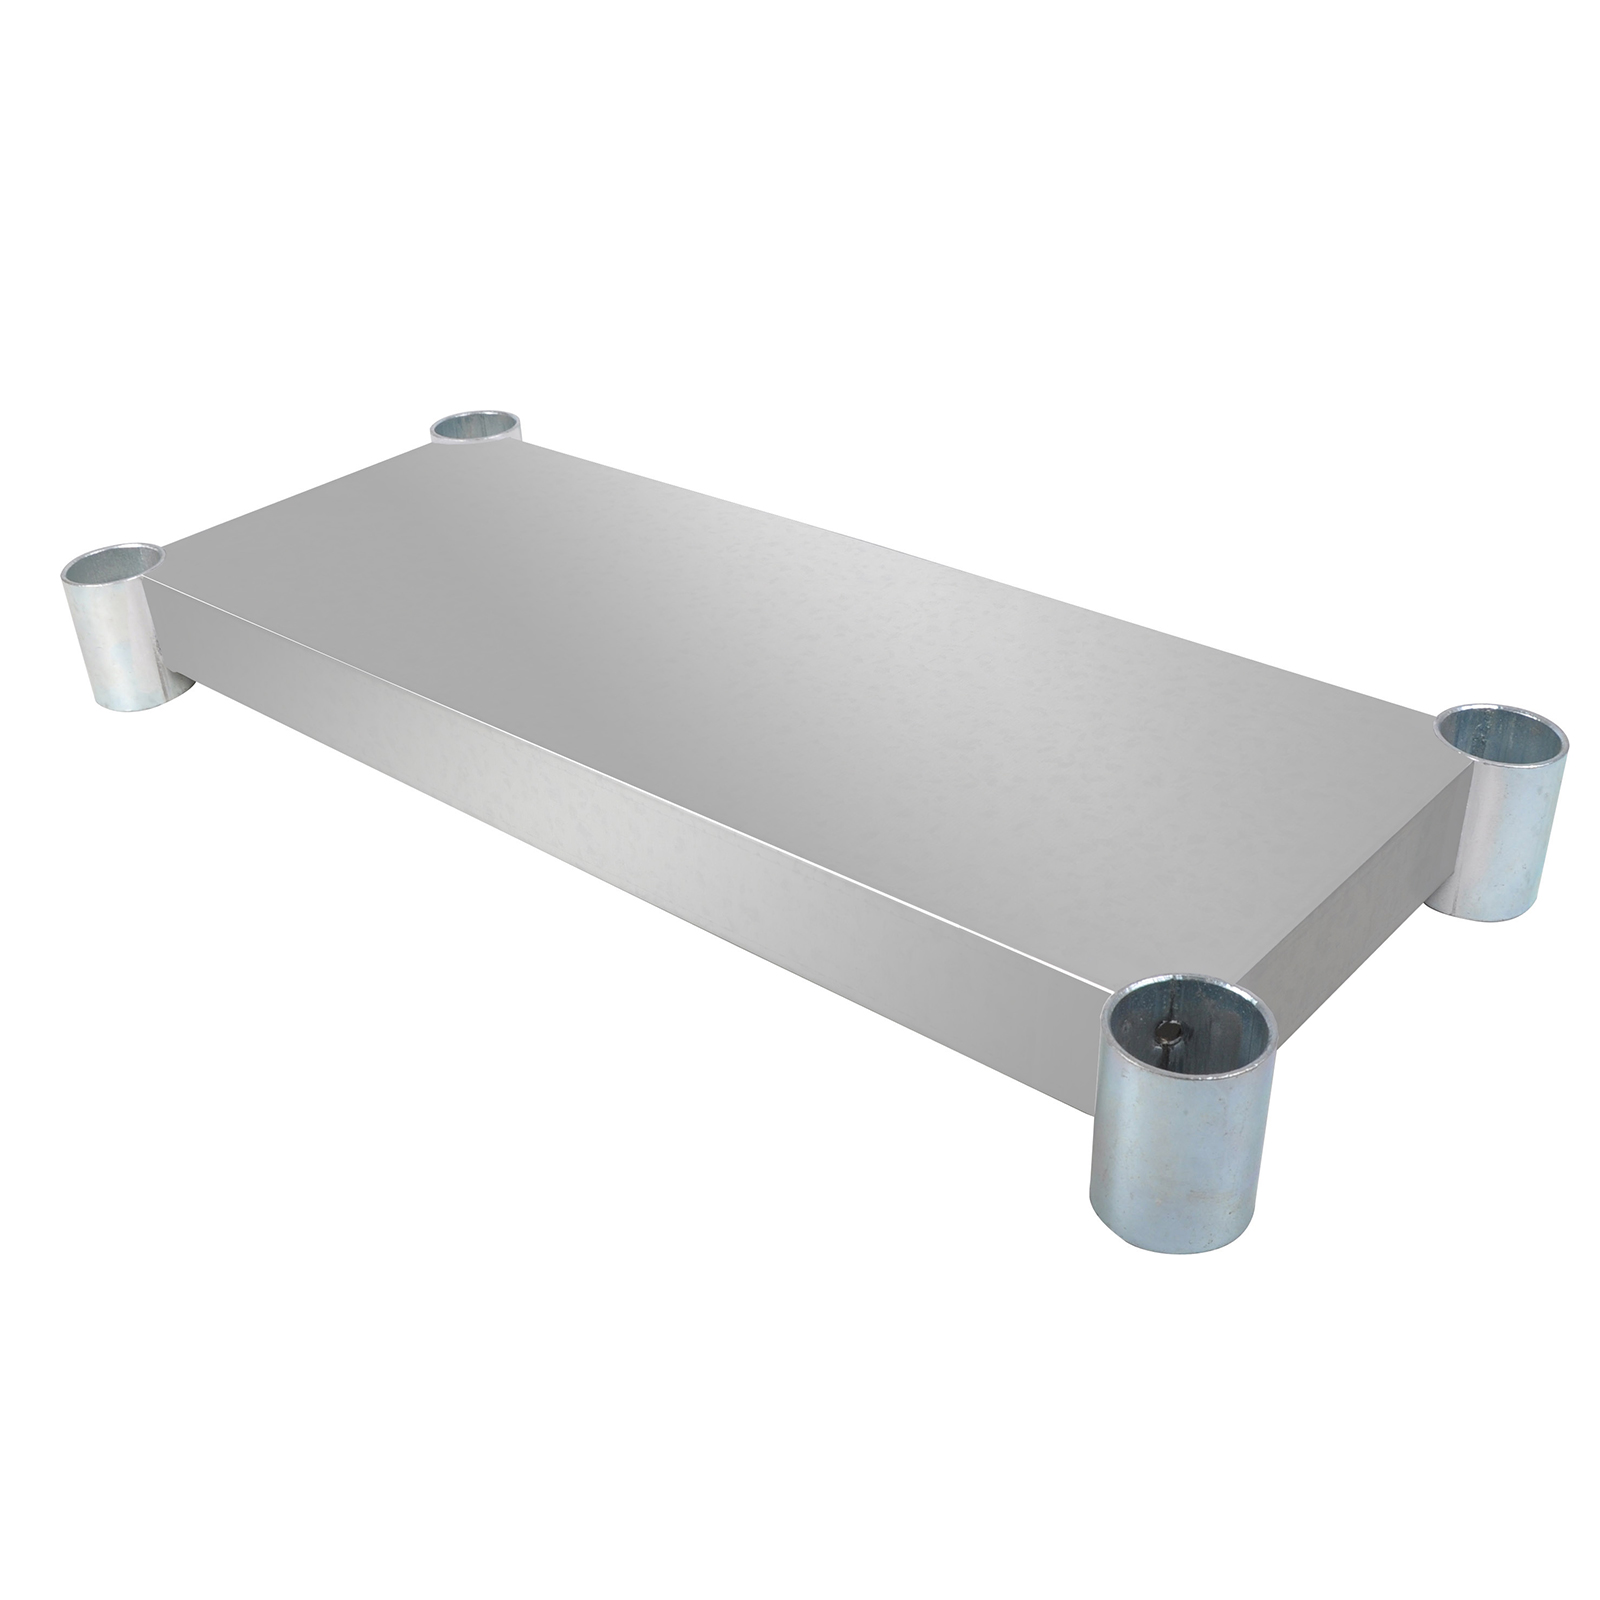 BK Resources SVTS-1830 work table, undershelf